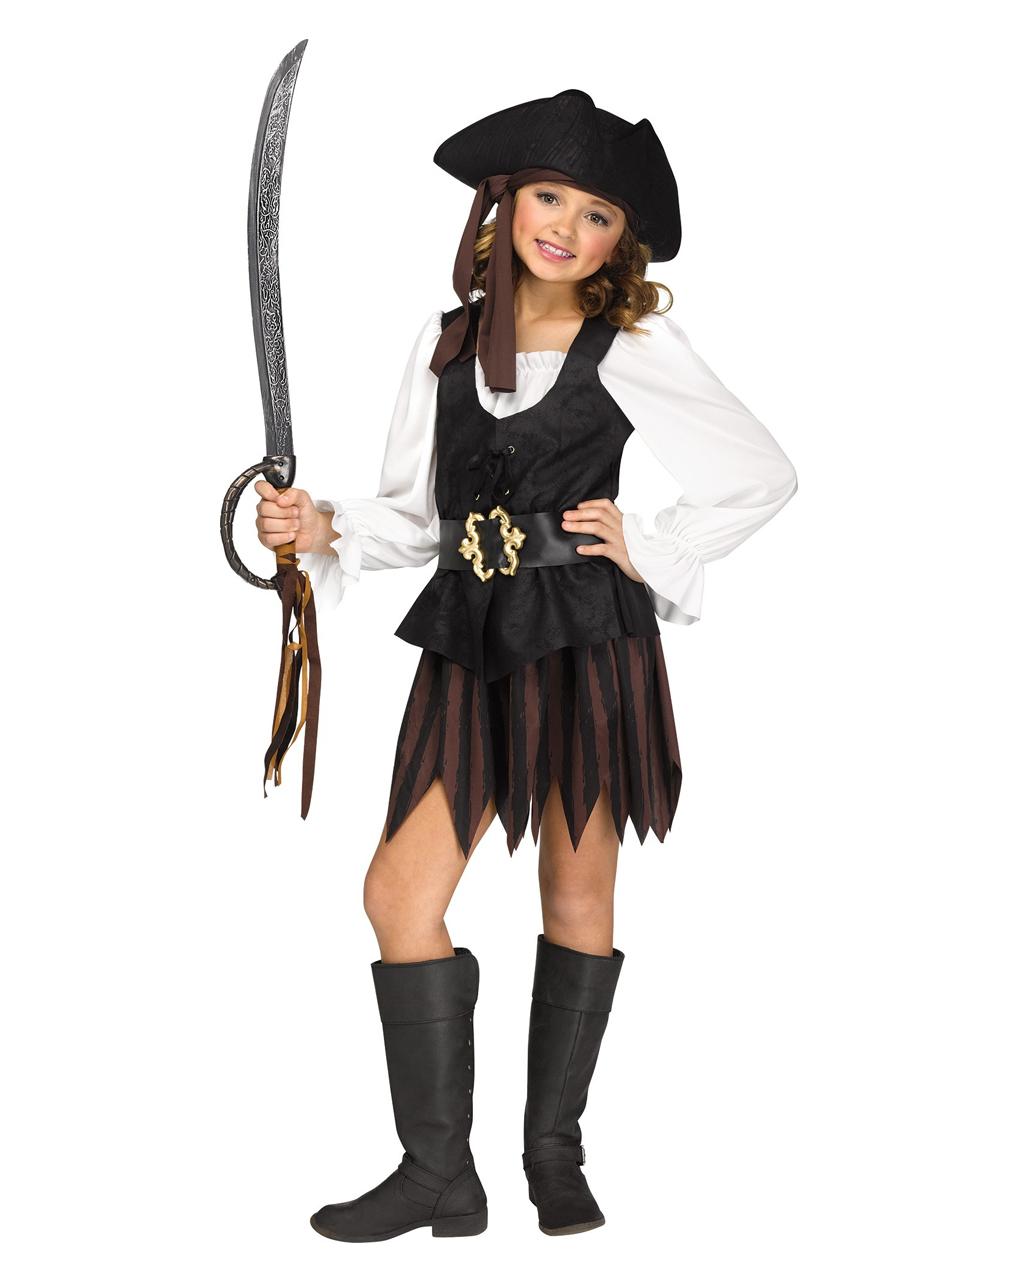 Rustikales Piraten Madchen Kostum Fur Fasching Horror Shop Com